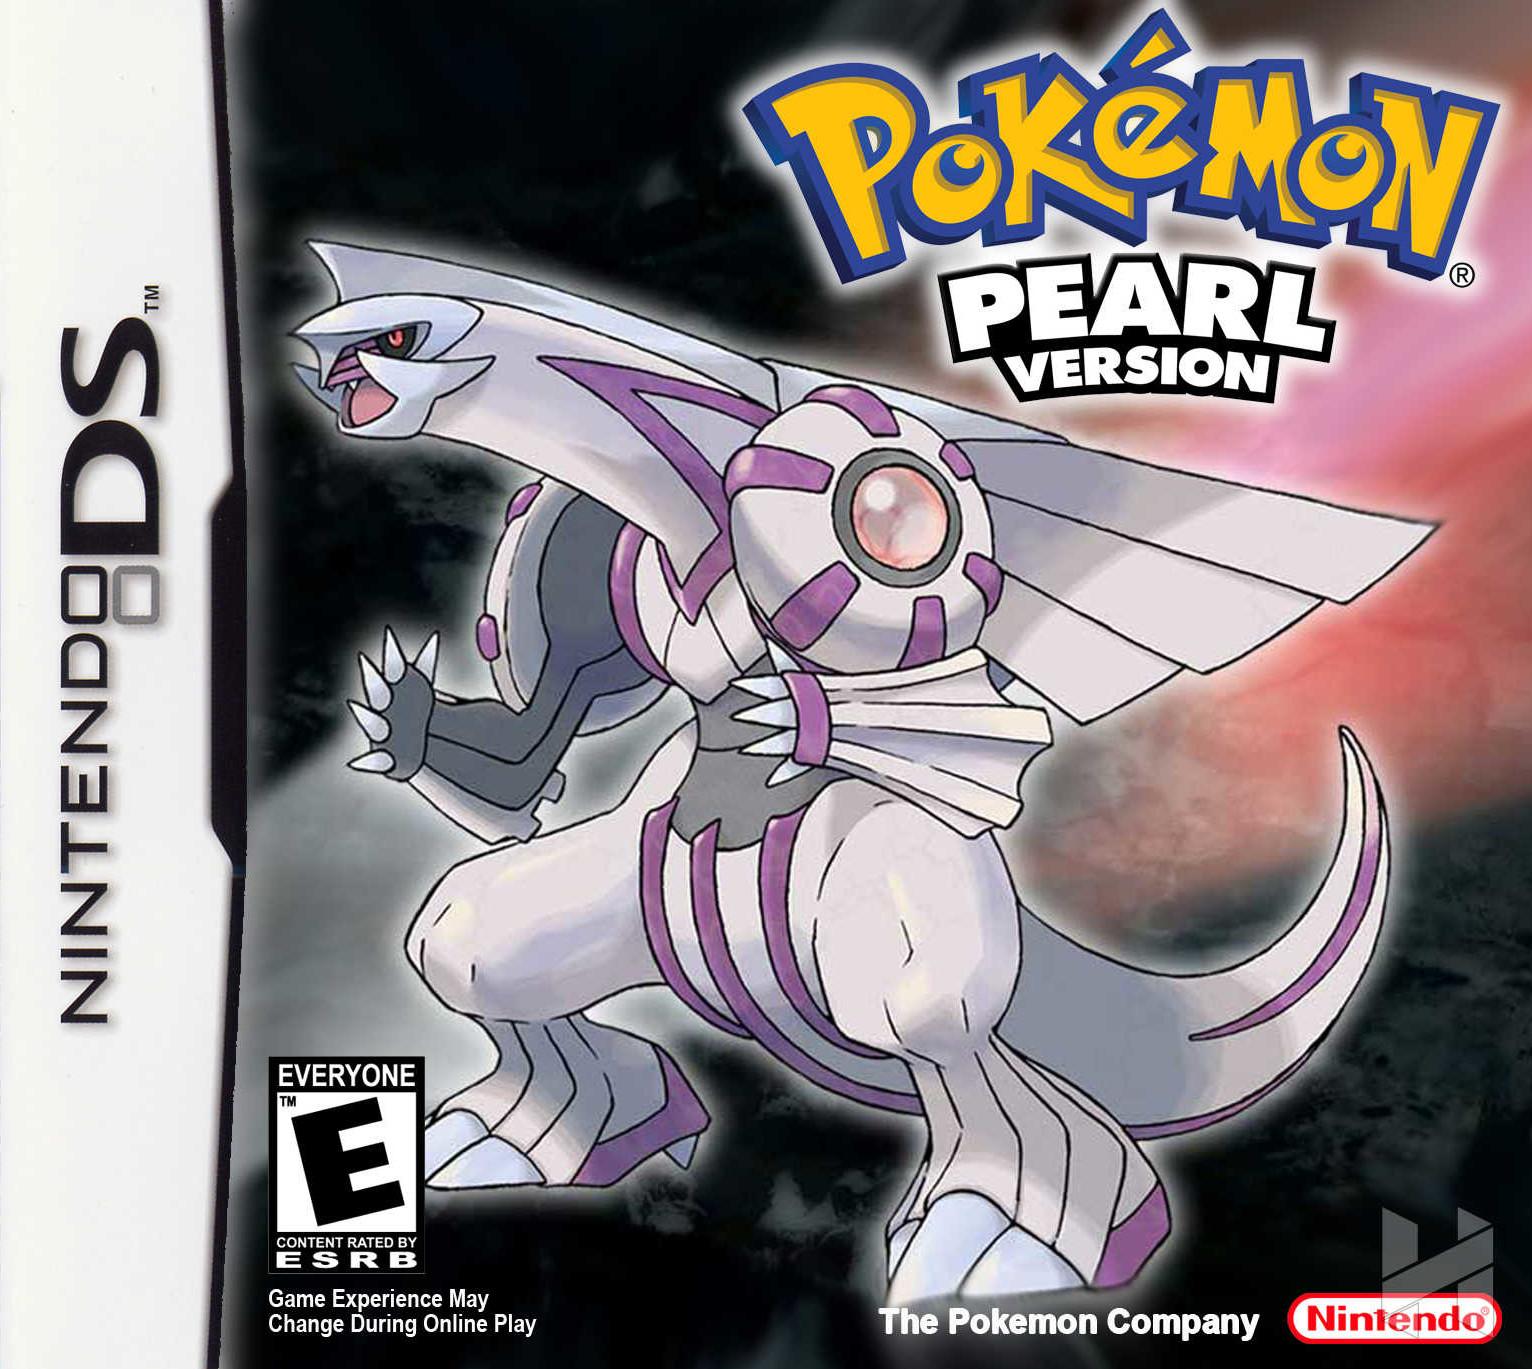 Pokemon Pearl 2